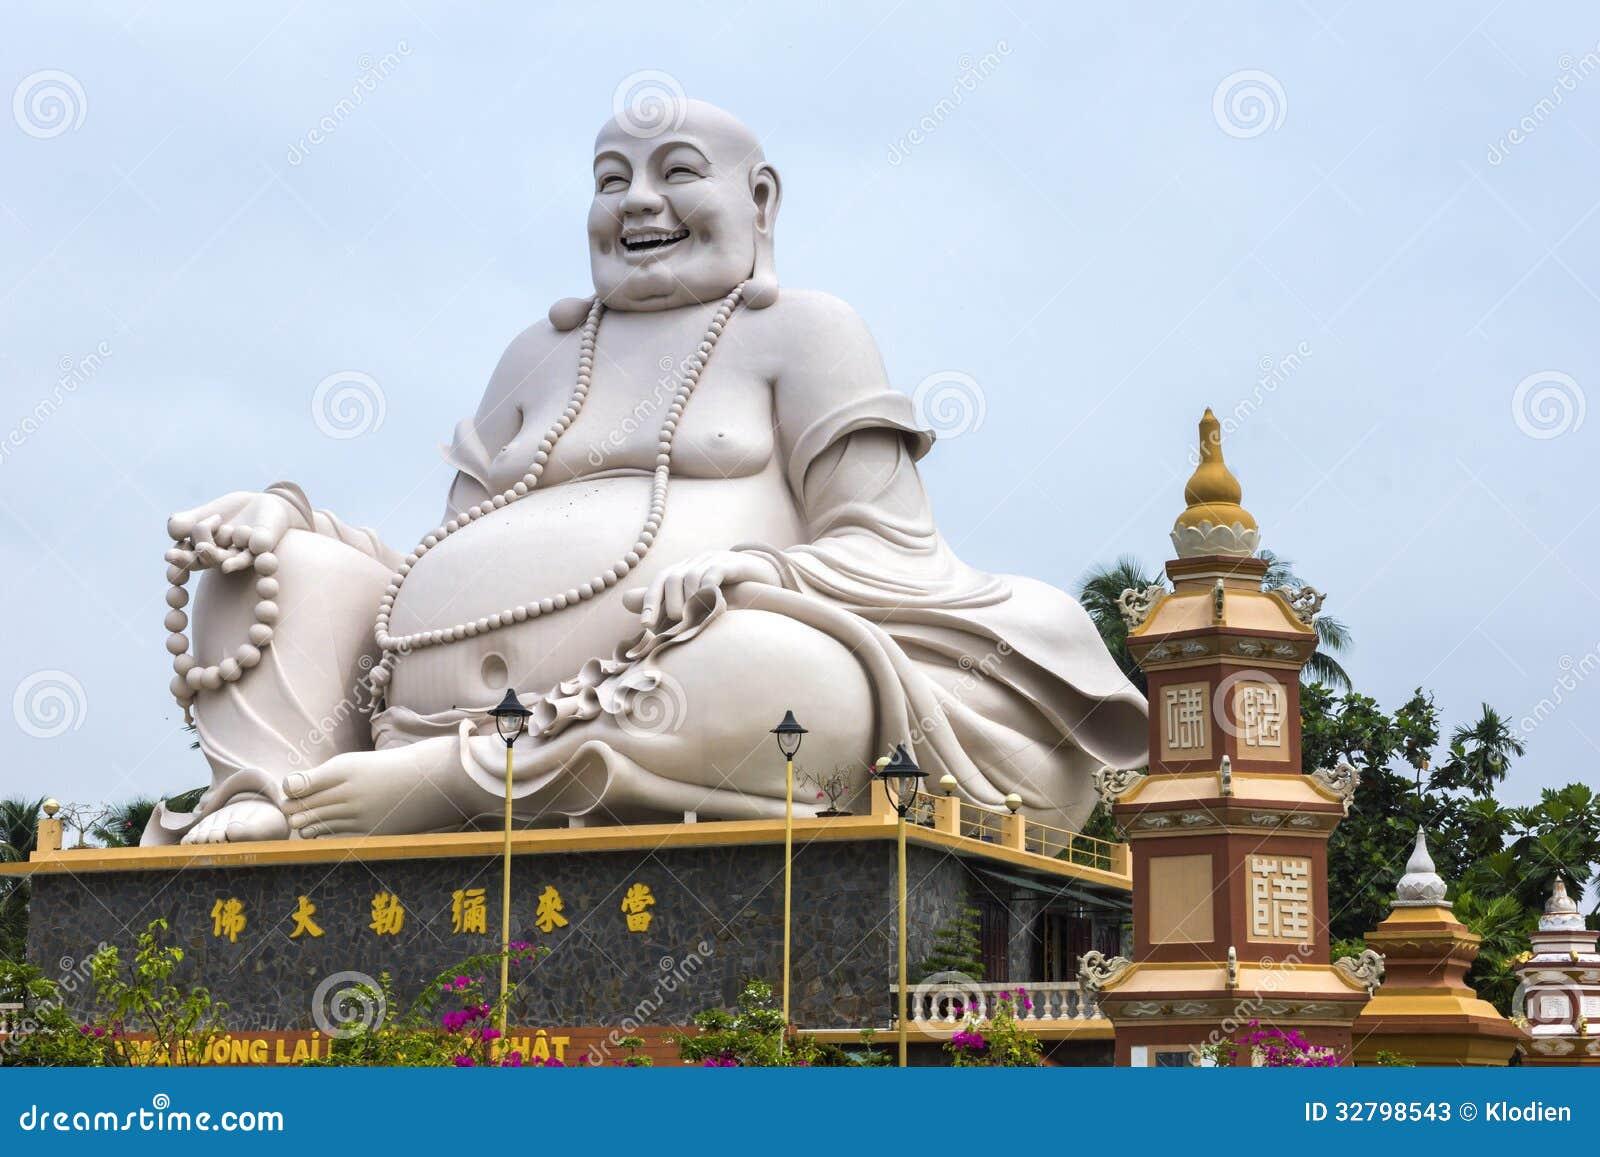 Vinh Vietnam  city pictures gallery : ... : Massive white Sitting Buddha statue at Vinh Trang Pagoda, Vietnam